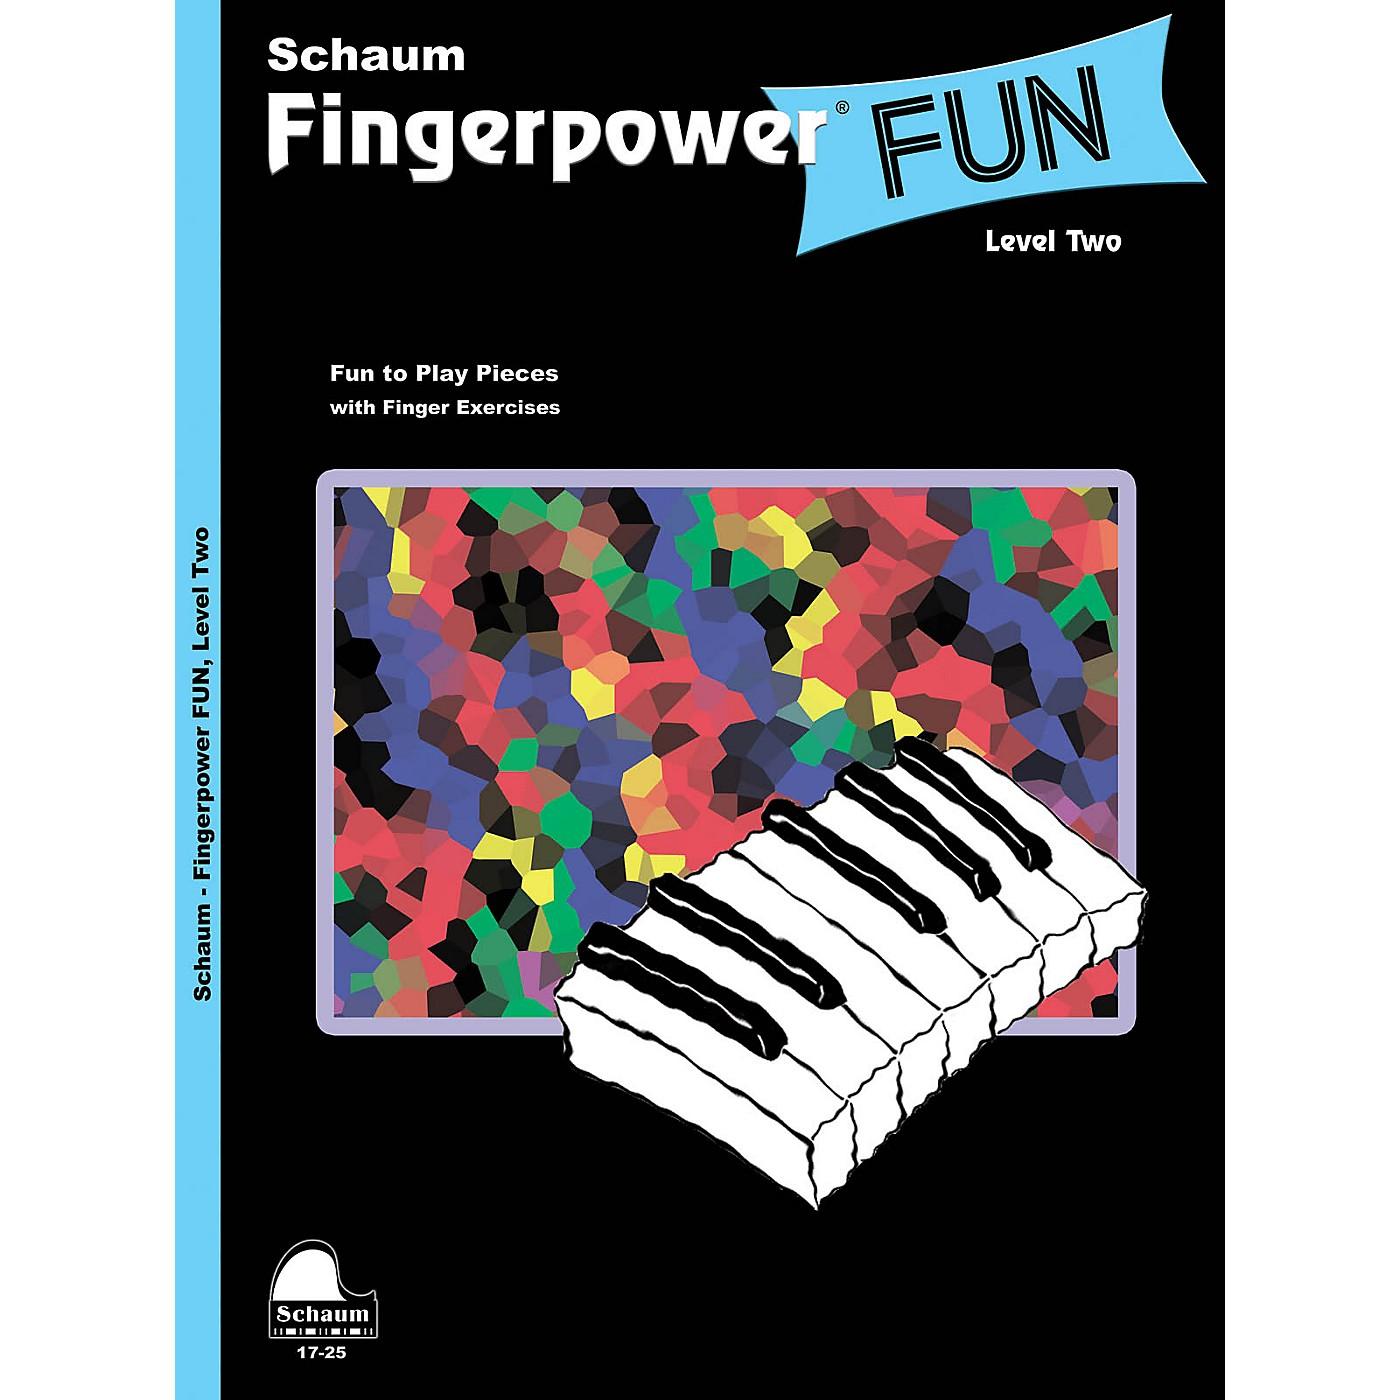 SCHAUM Fingerpower® Fun (Level 2 Upper Elem Level) Educational Piano Book thumbnail